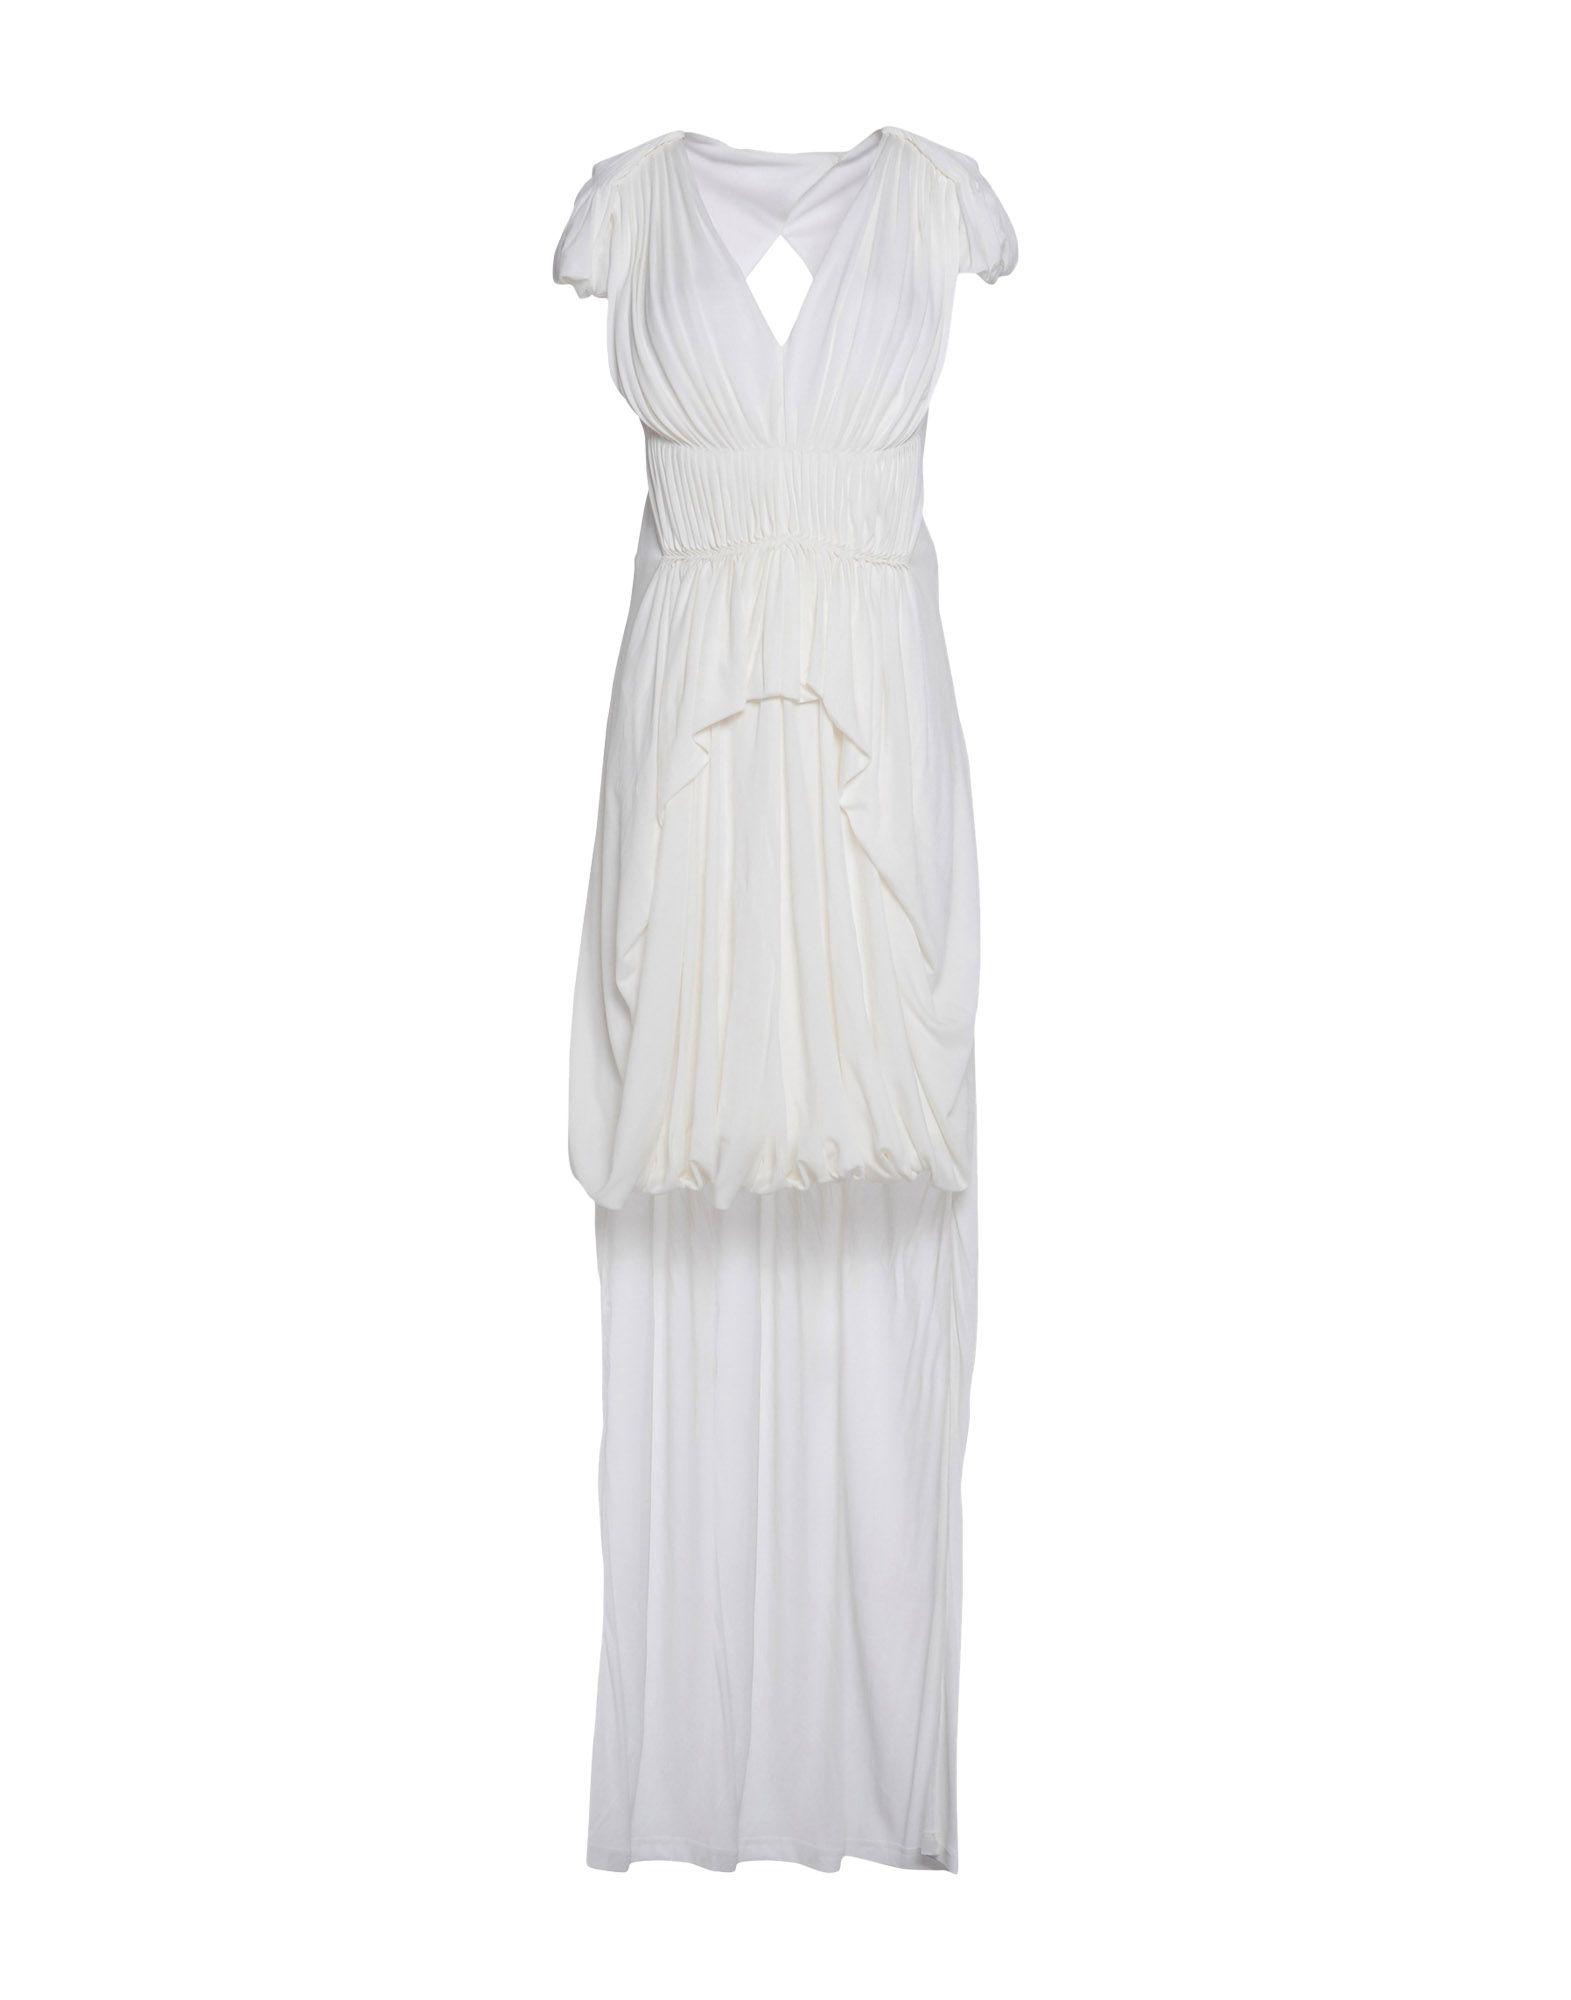 SOPHIA KOKOSALAKI Длинное платье sexy woman длинное платье